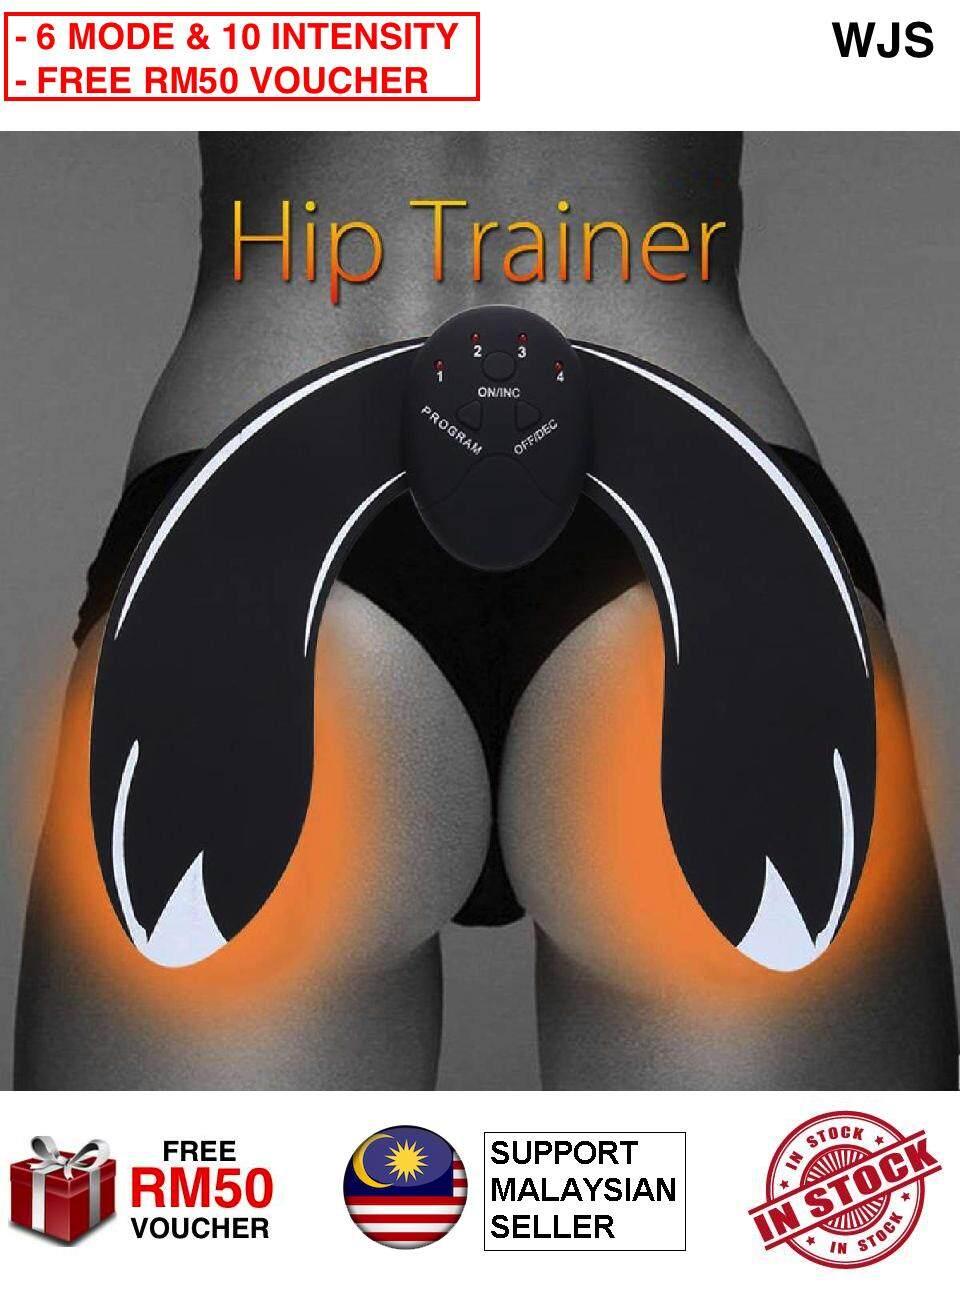 (6 MODES & 10 INTENSITY) WJS Intelligent Hip Trainer Buttocks Lifting Up Fitness Gear Body Beauty Shaper Machine Buttock Hip Shaper Hips Massager Trainer Bottom Training  (FREE RM50 VOUCHER)